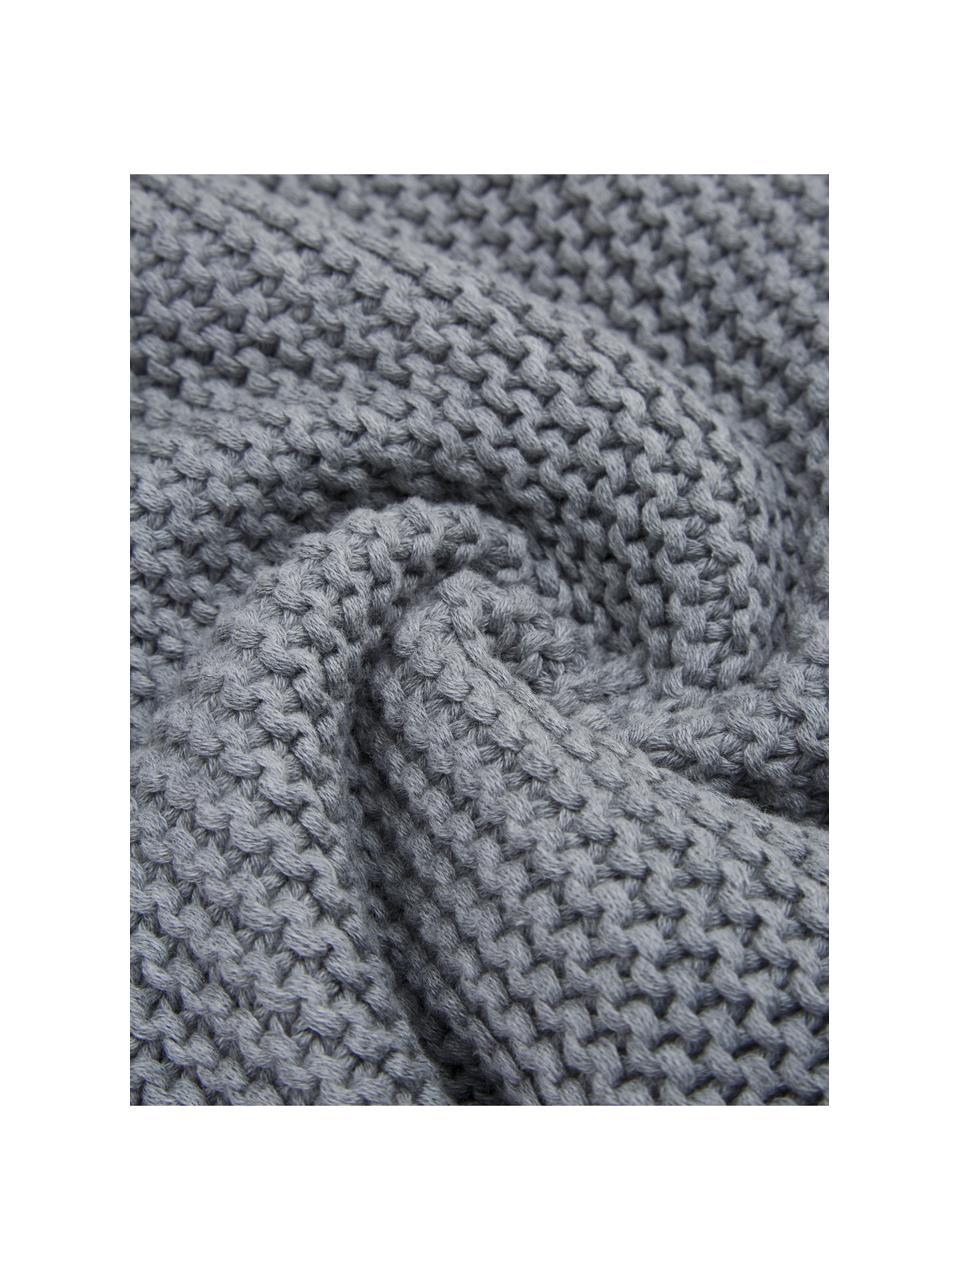 Strickdecke Adalyn aus Bio-Baumwolle in Grau, 100% Bio-Baumwolle, GOTS-zertifiziert, Grau, 150 x 200 cm